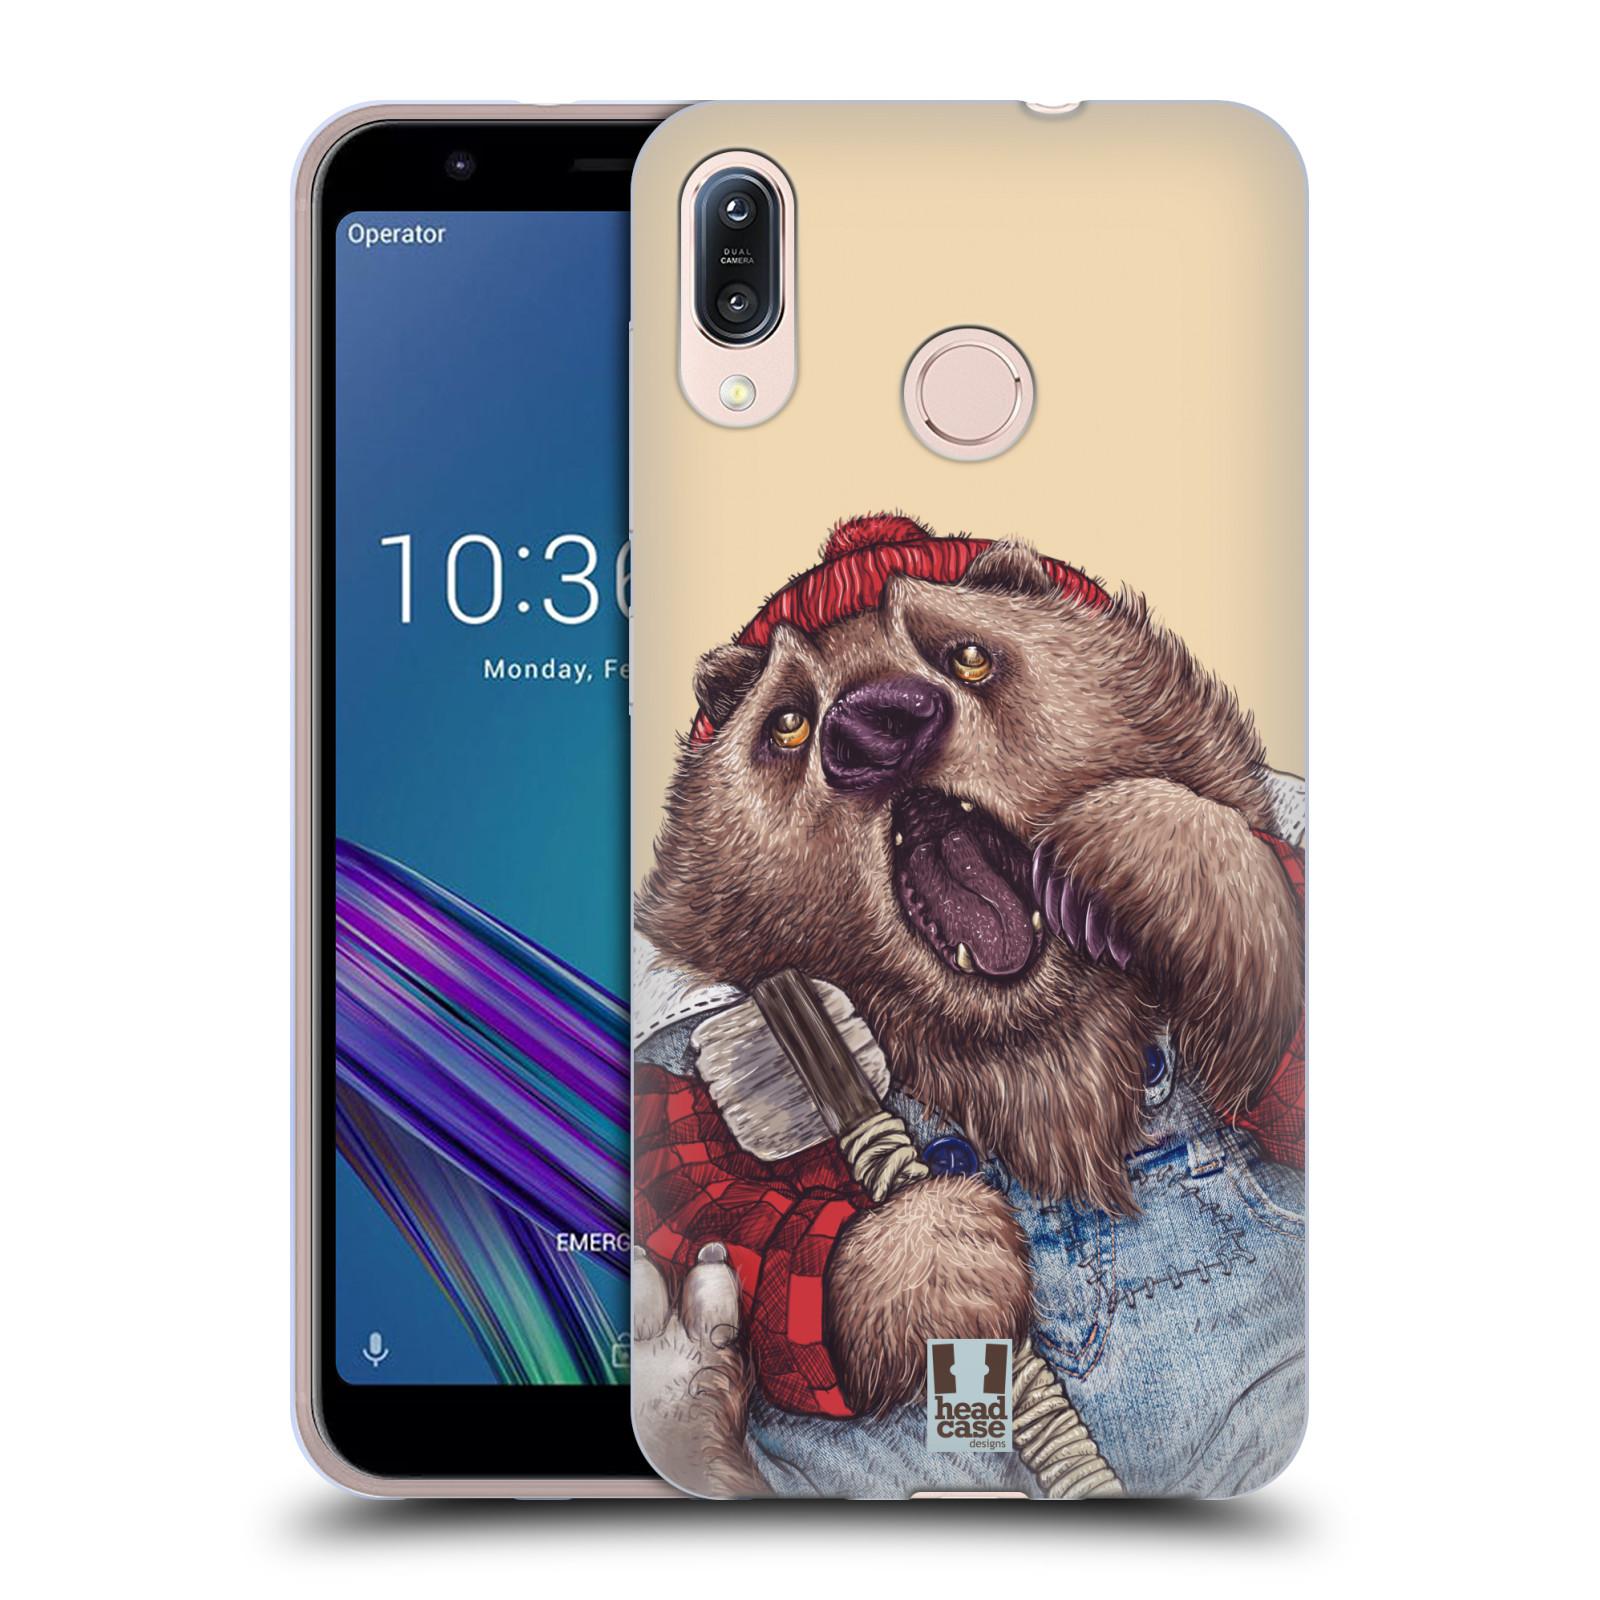 Silikonové pouzdro na mobil Asus Zenfone Max M1 ZB555KL - Head Case - ANIMPLA MEDVĚD